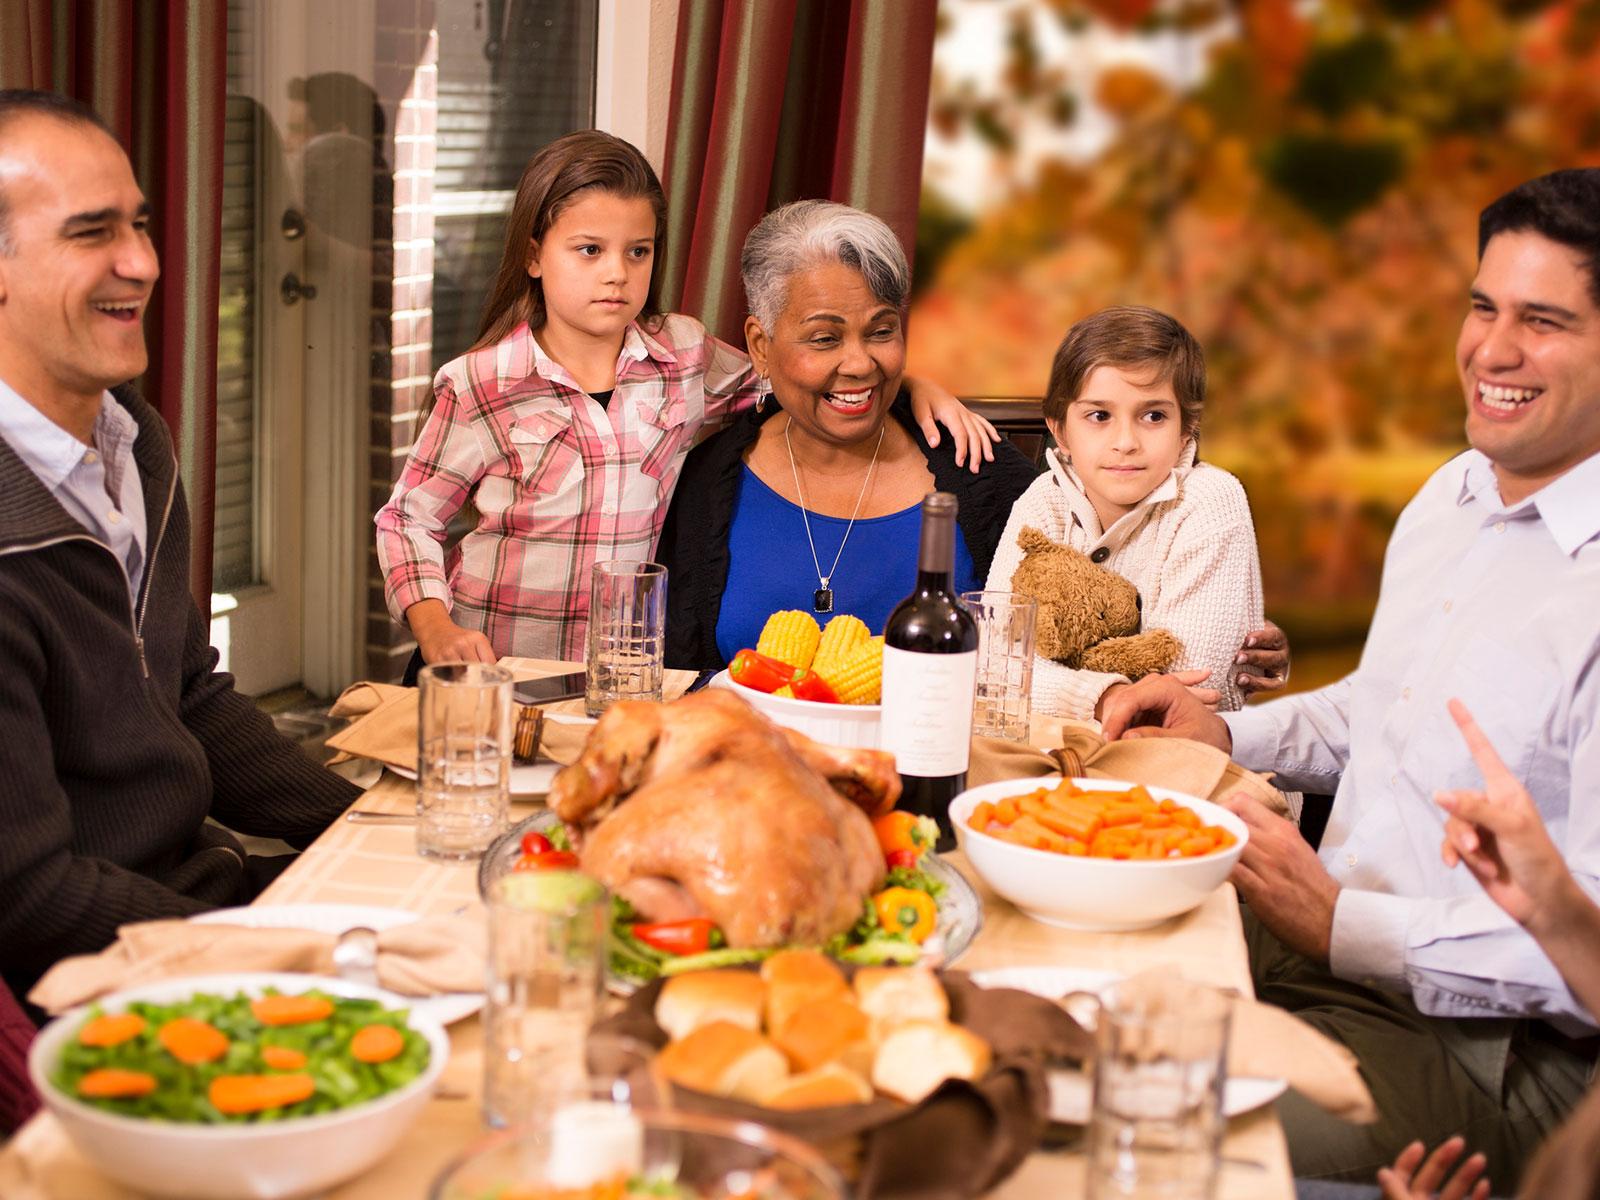 surving-family-holidays-1600.jpg